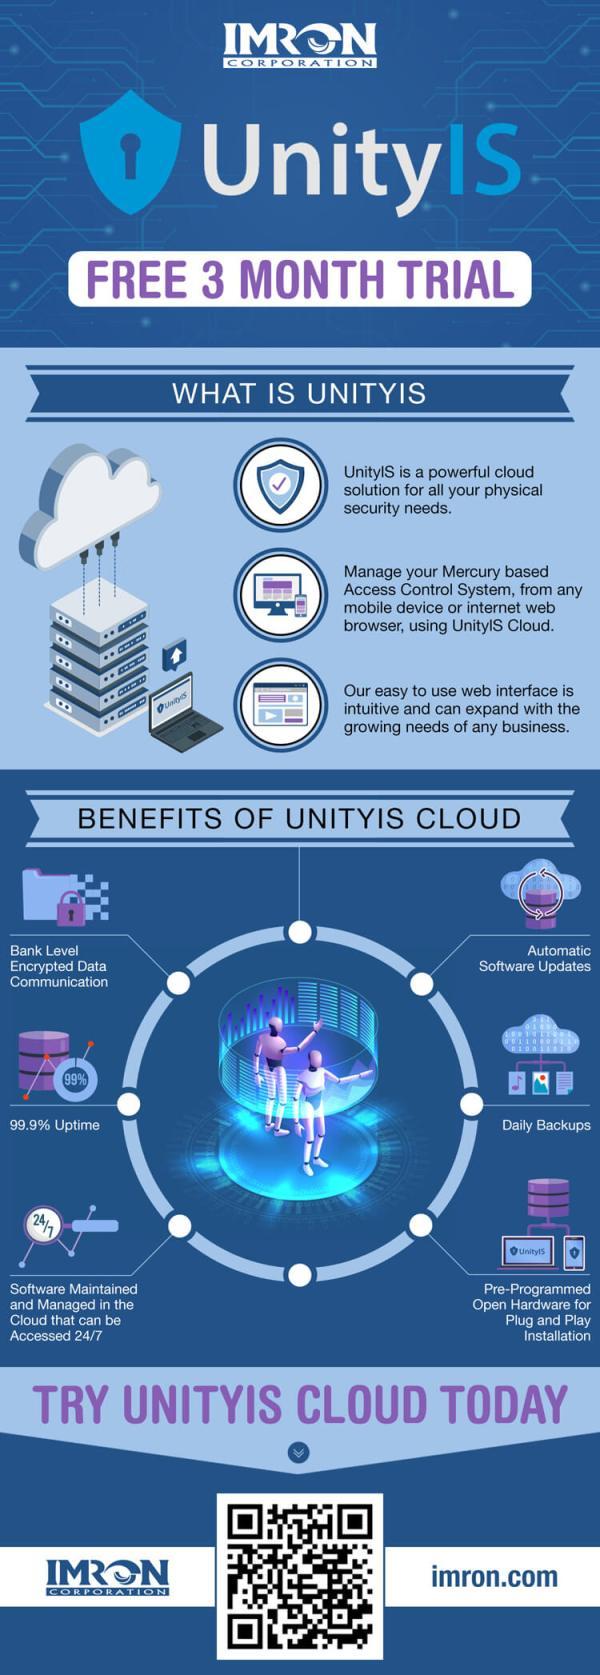 IMRON-infographic